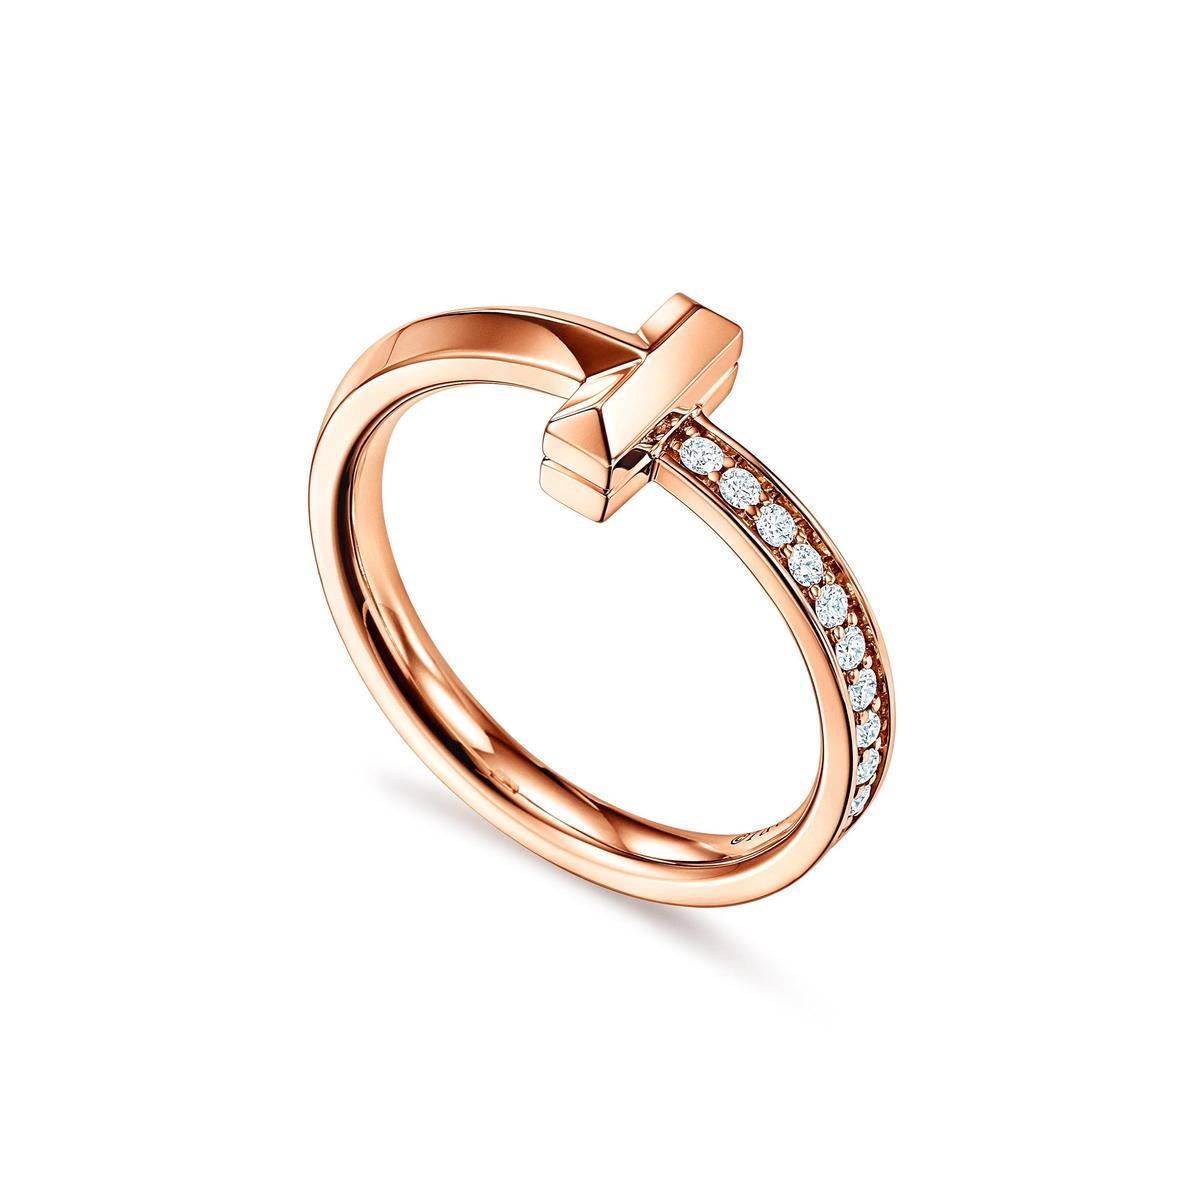 Tiffany T1 18K玫瑰金窄版鑲鑽戒指。NT$53,000(Tiffany & Co. 提供)